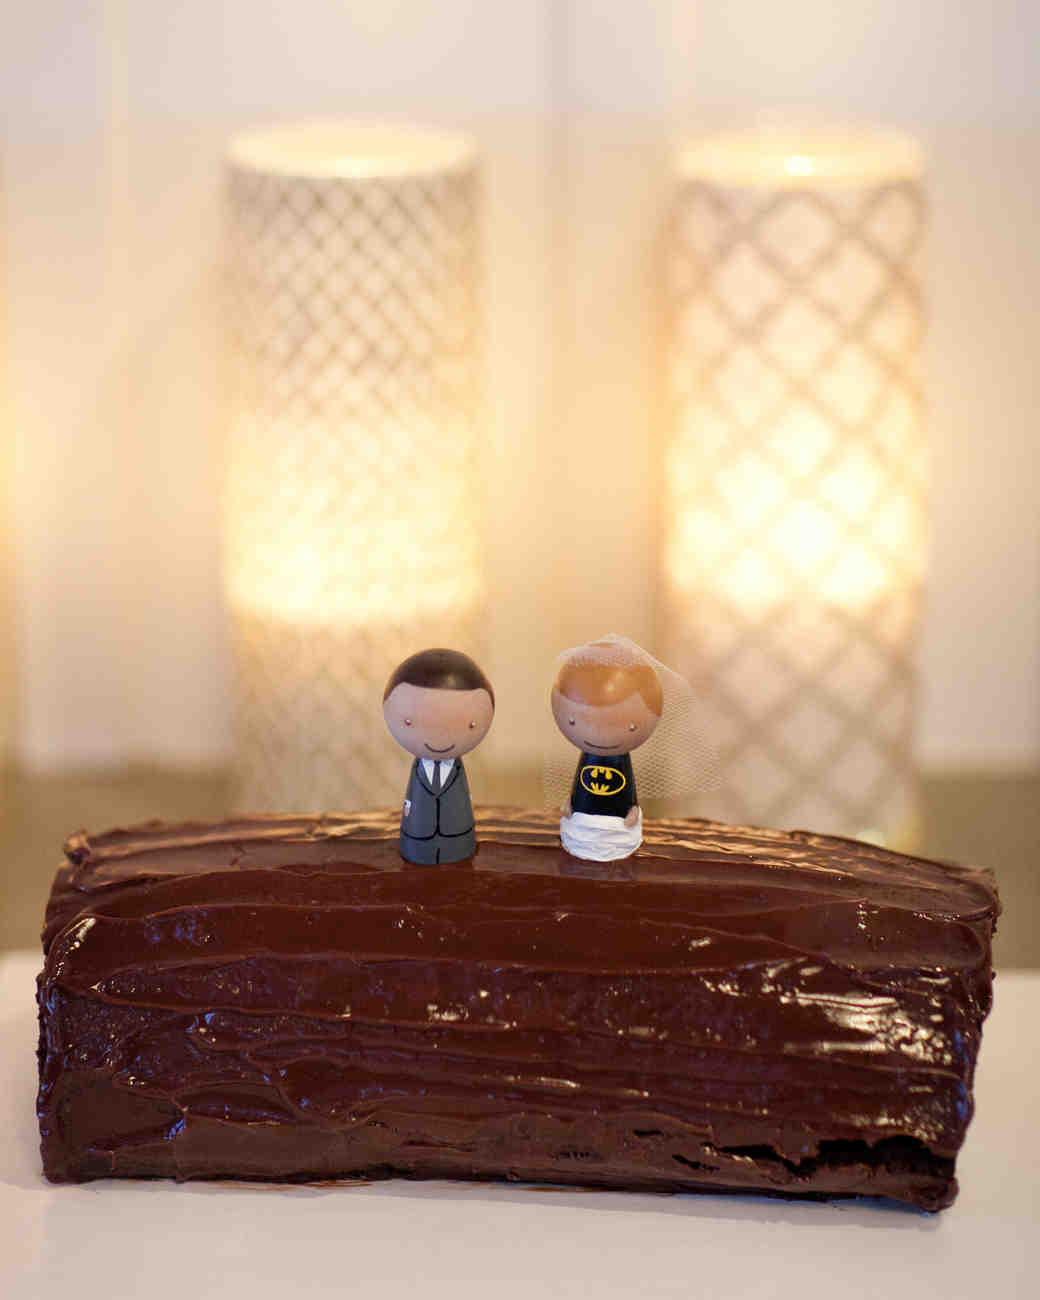 Grooms Wedding Cake Ideas: 20 Unique Groom's Cake Ideas